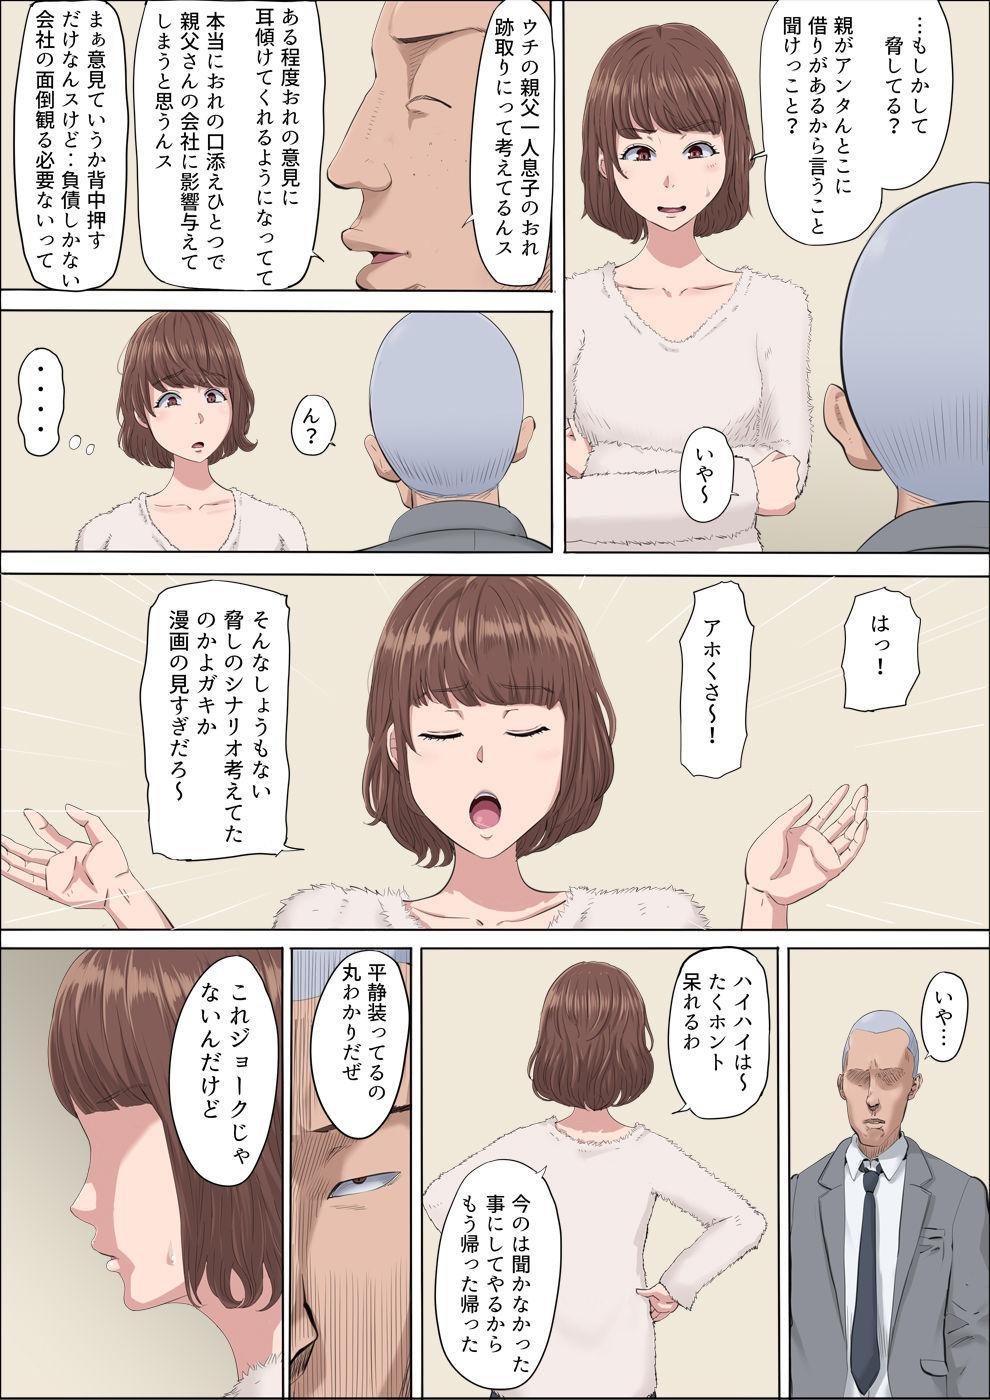 [Cotton house] Aya Nee ~Ubawareta Osananajimi~ 3 7